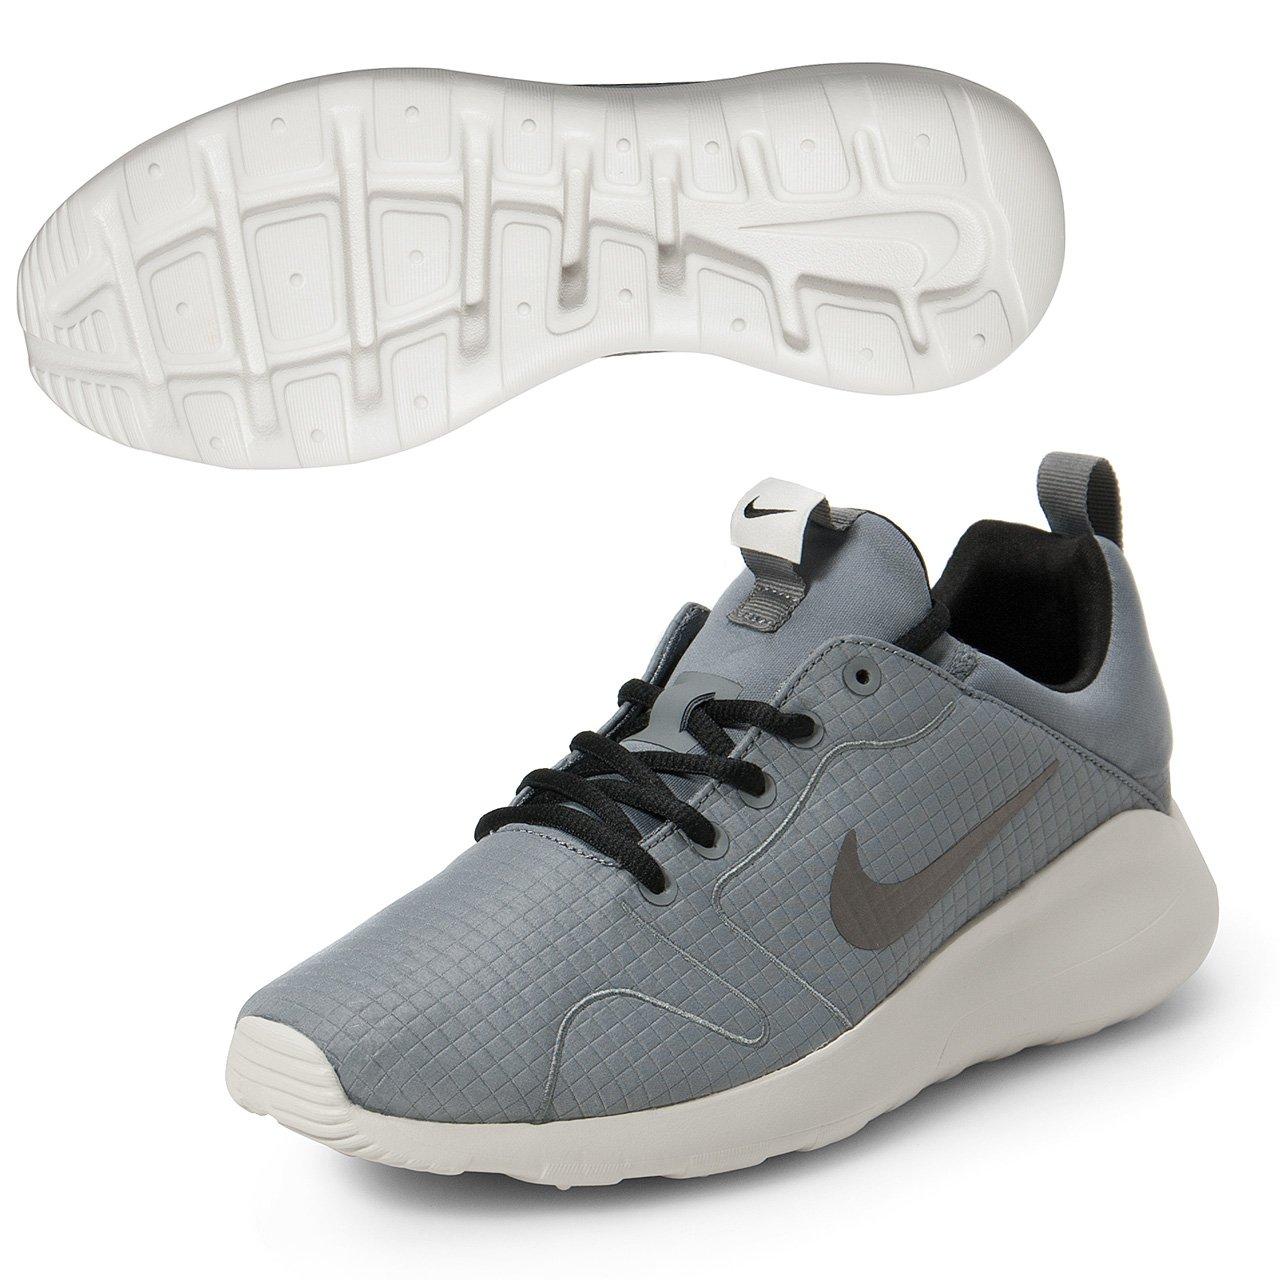 Uomo scarpa sportiva, colore Grigio , marca NIKE, modello Uomo Scarpa Sportiva NIKE NIKE KAISHI 2.0 PREM Grigio